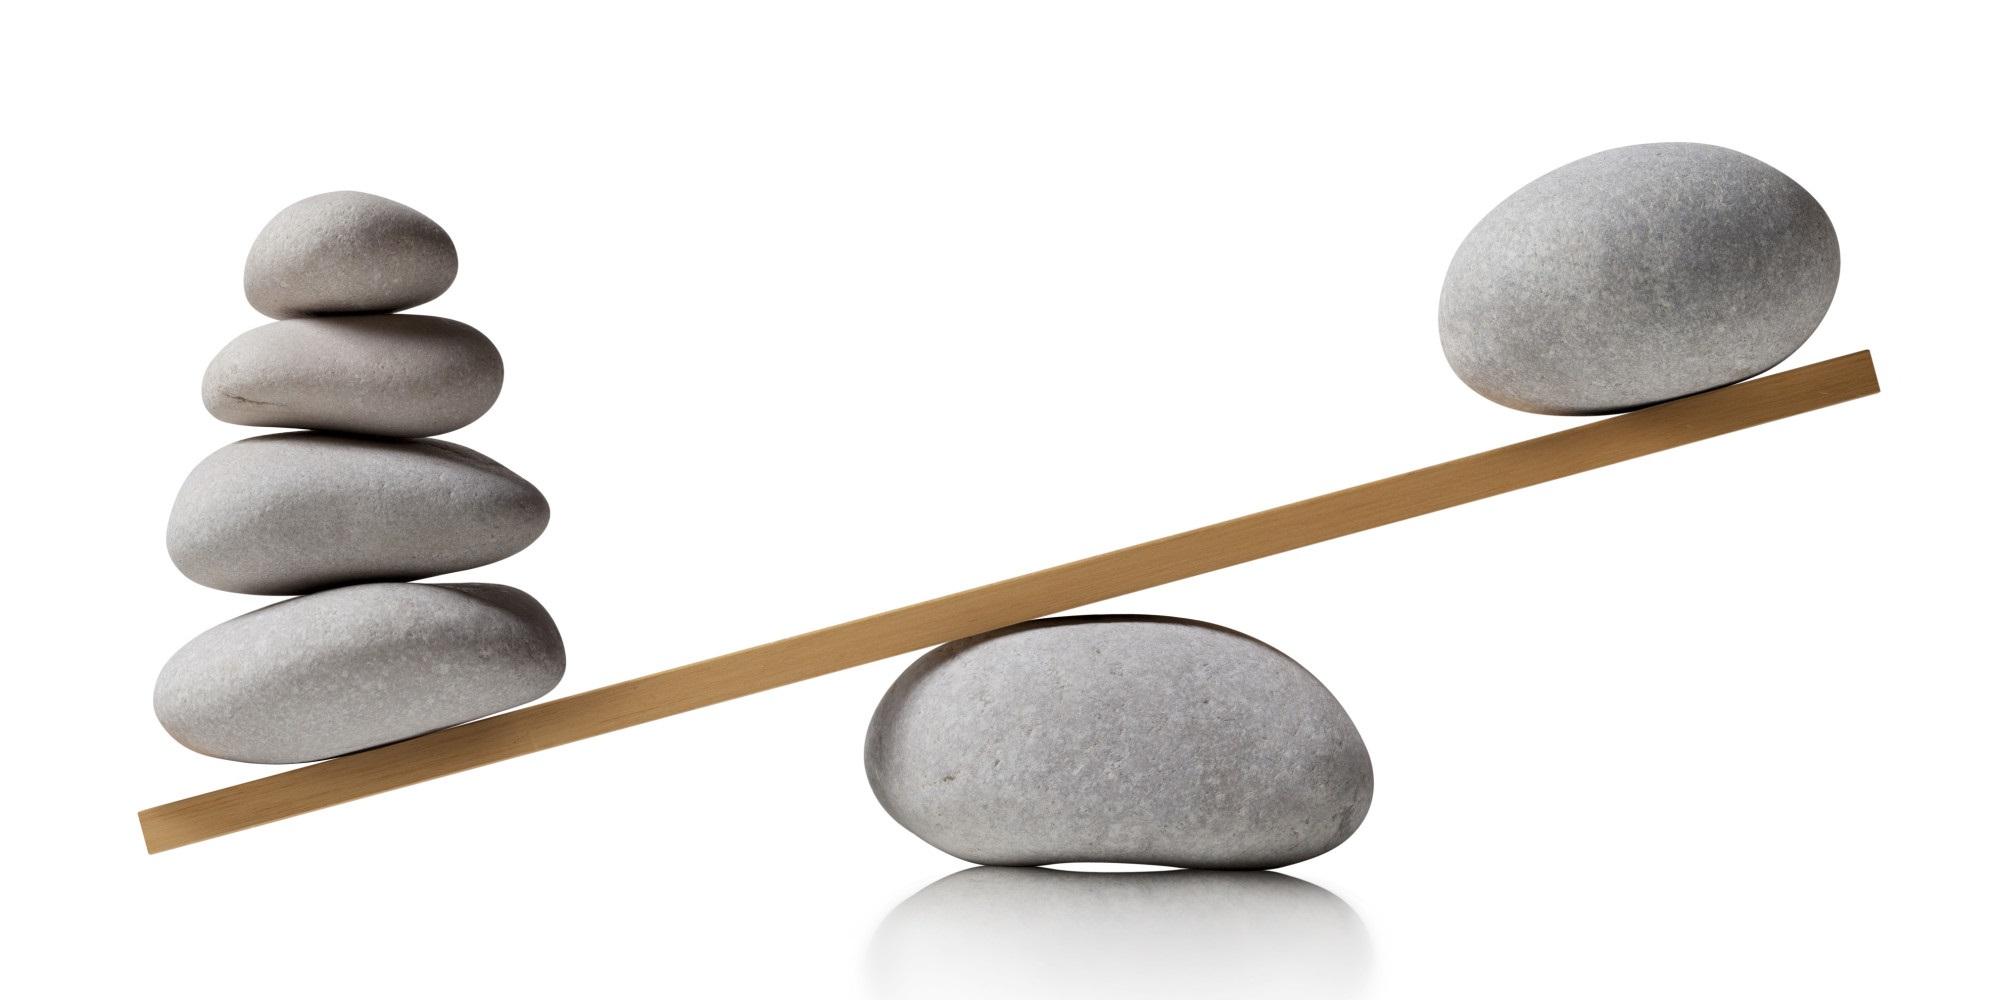 Weegschaal. Balancerende stenen